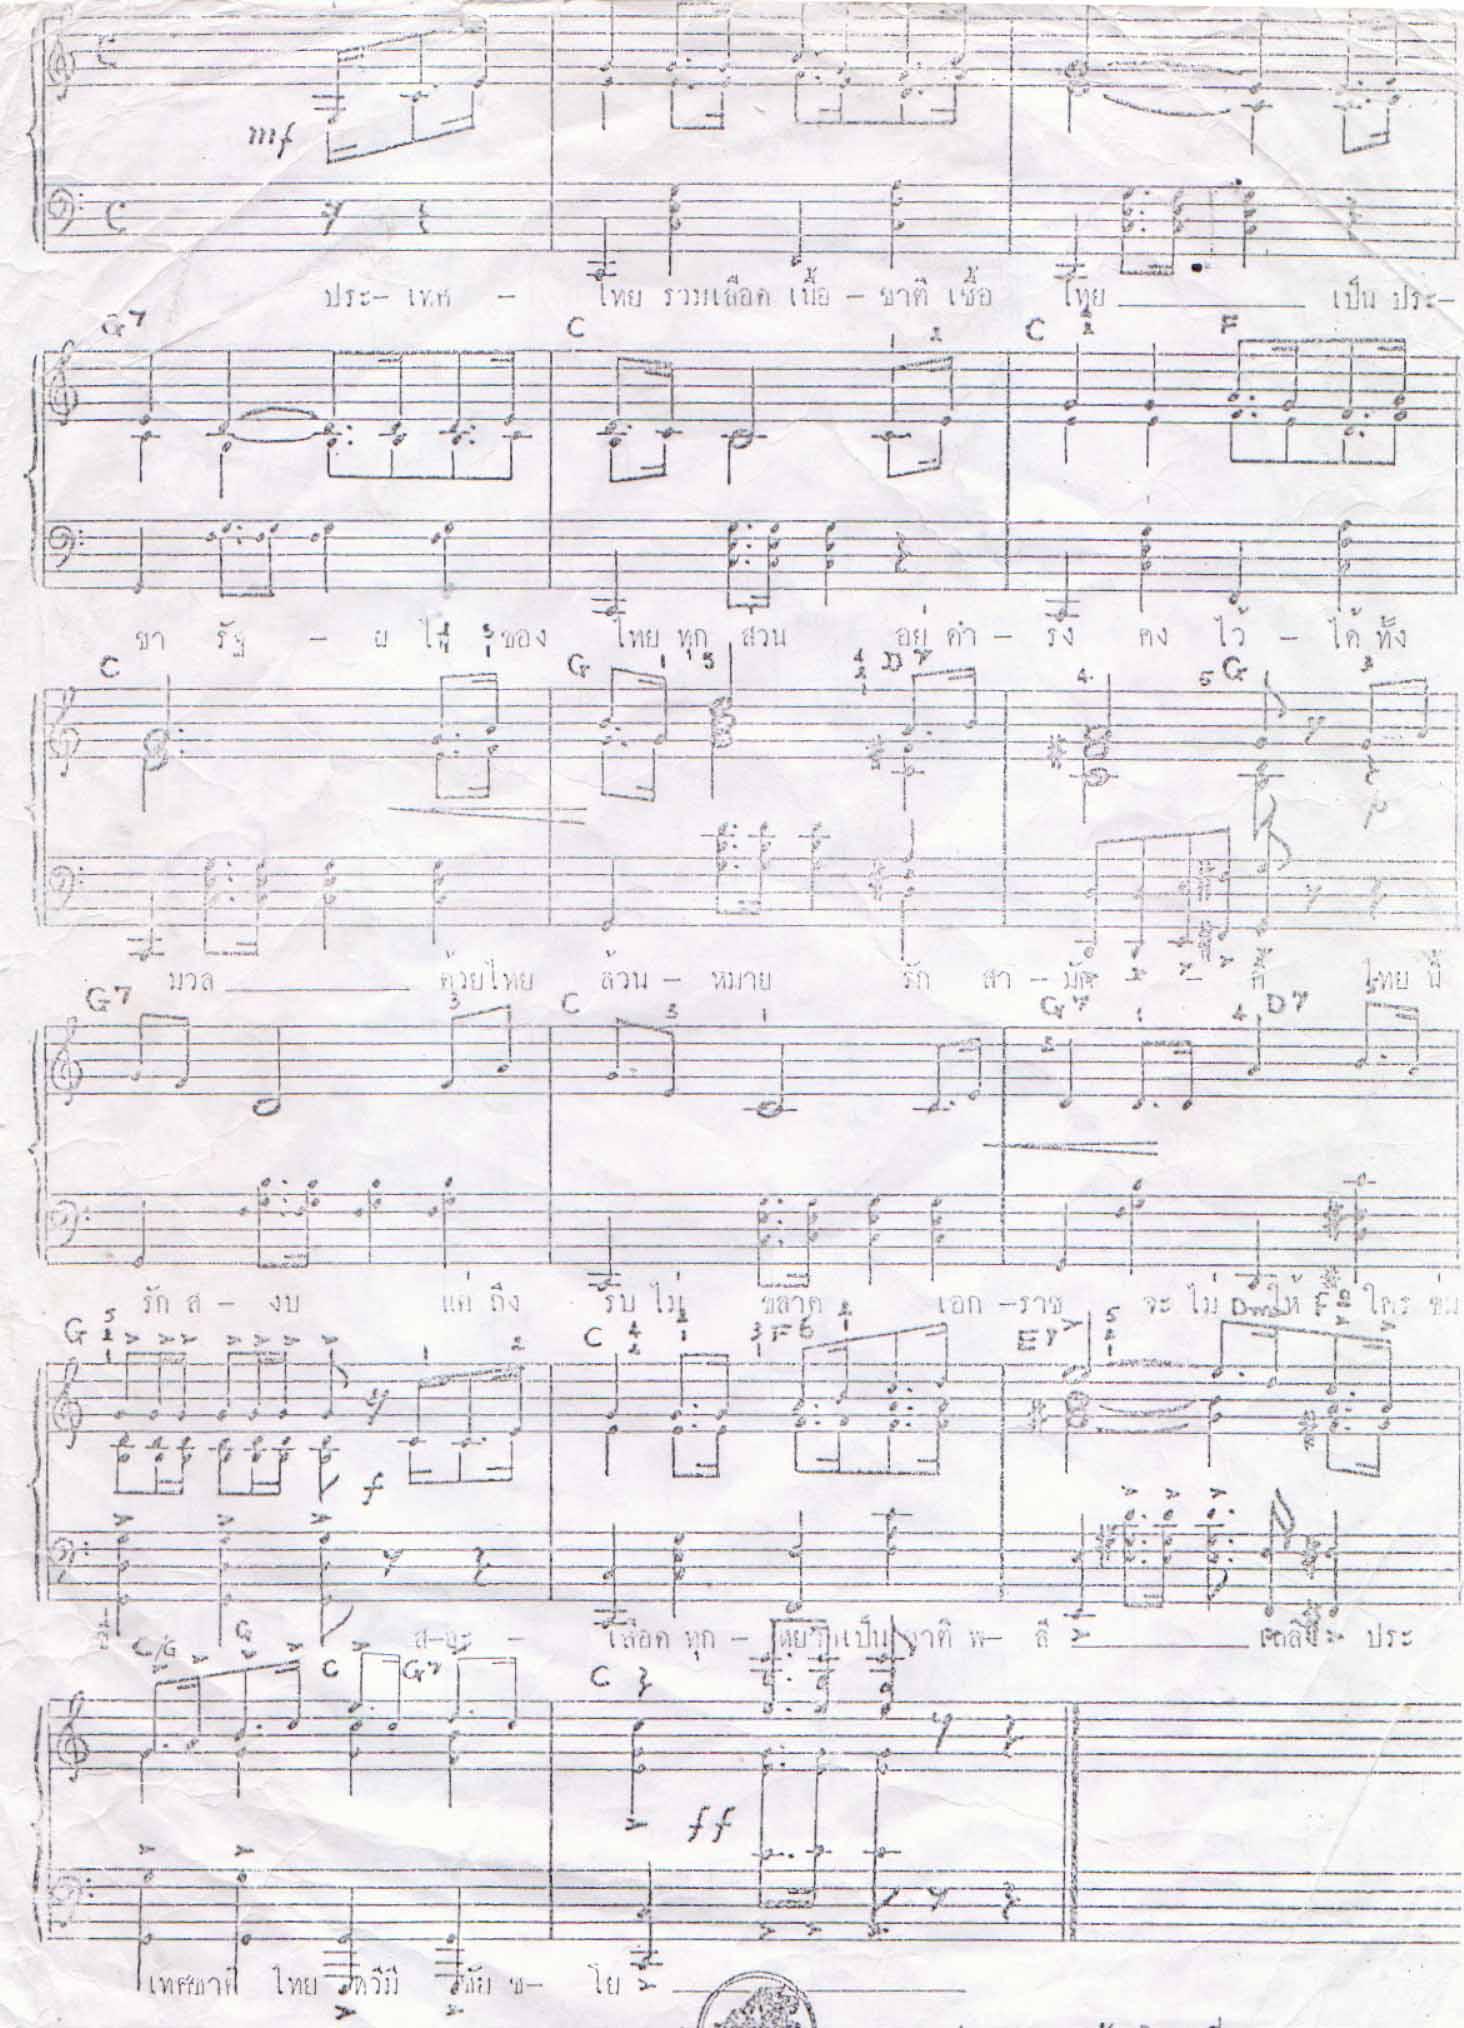 Thailand national anthem song, lyrics in english, free mp3